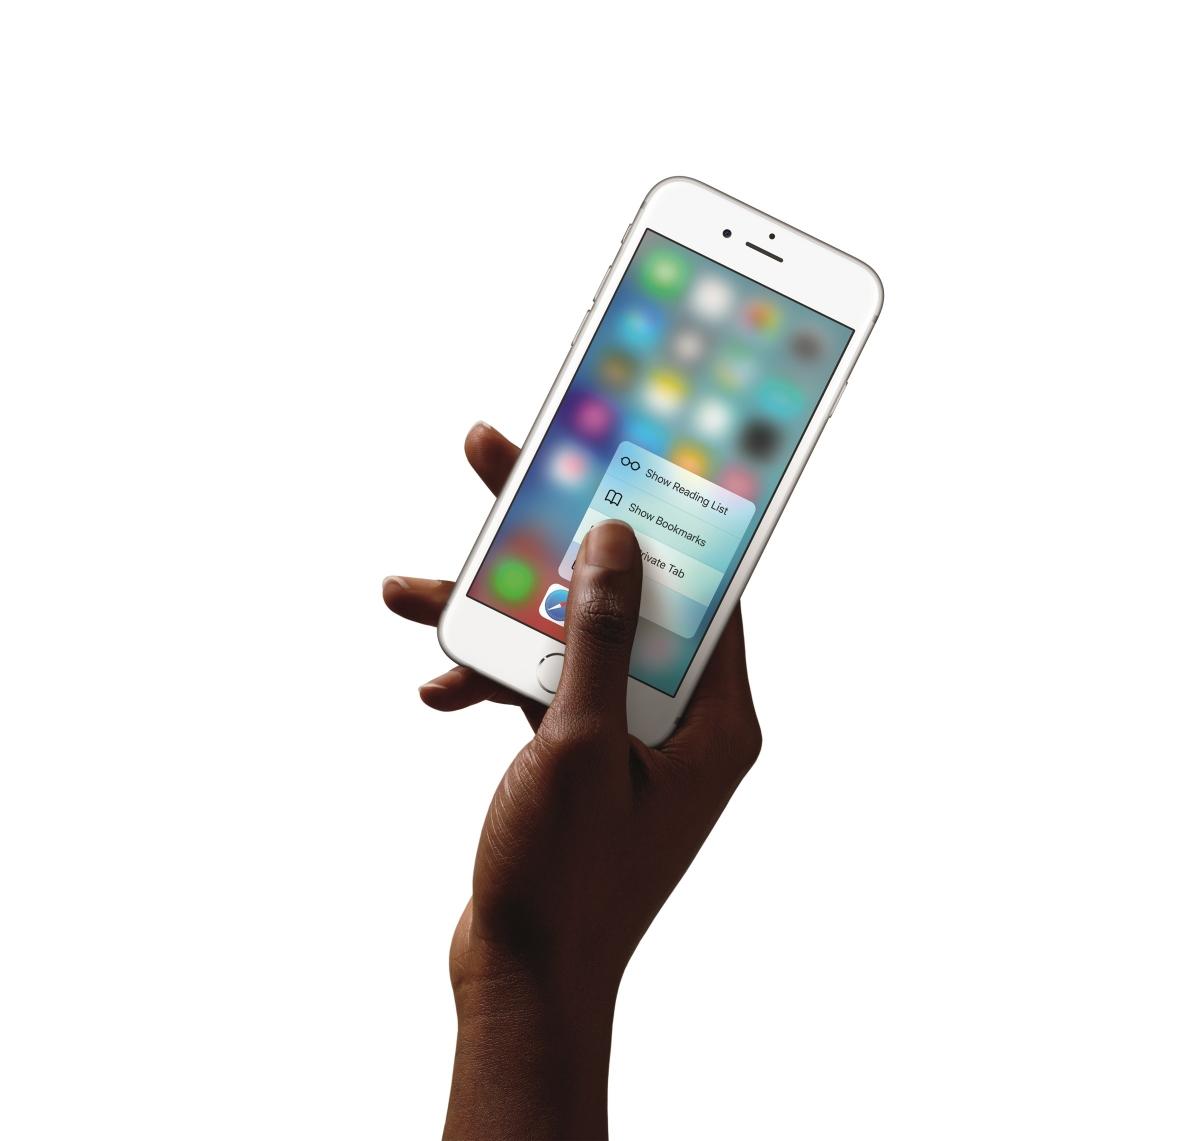 iPhone 6s Black Friday deals